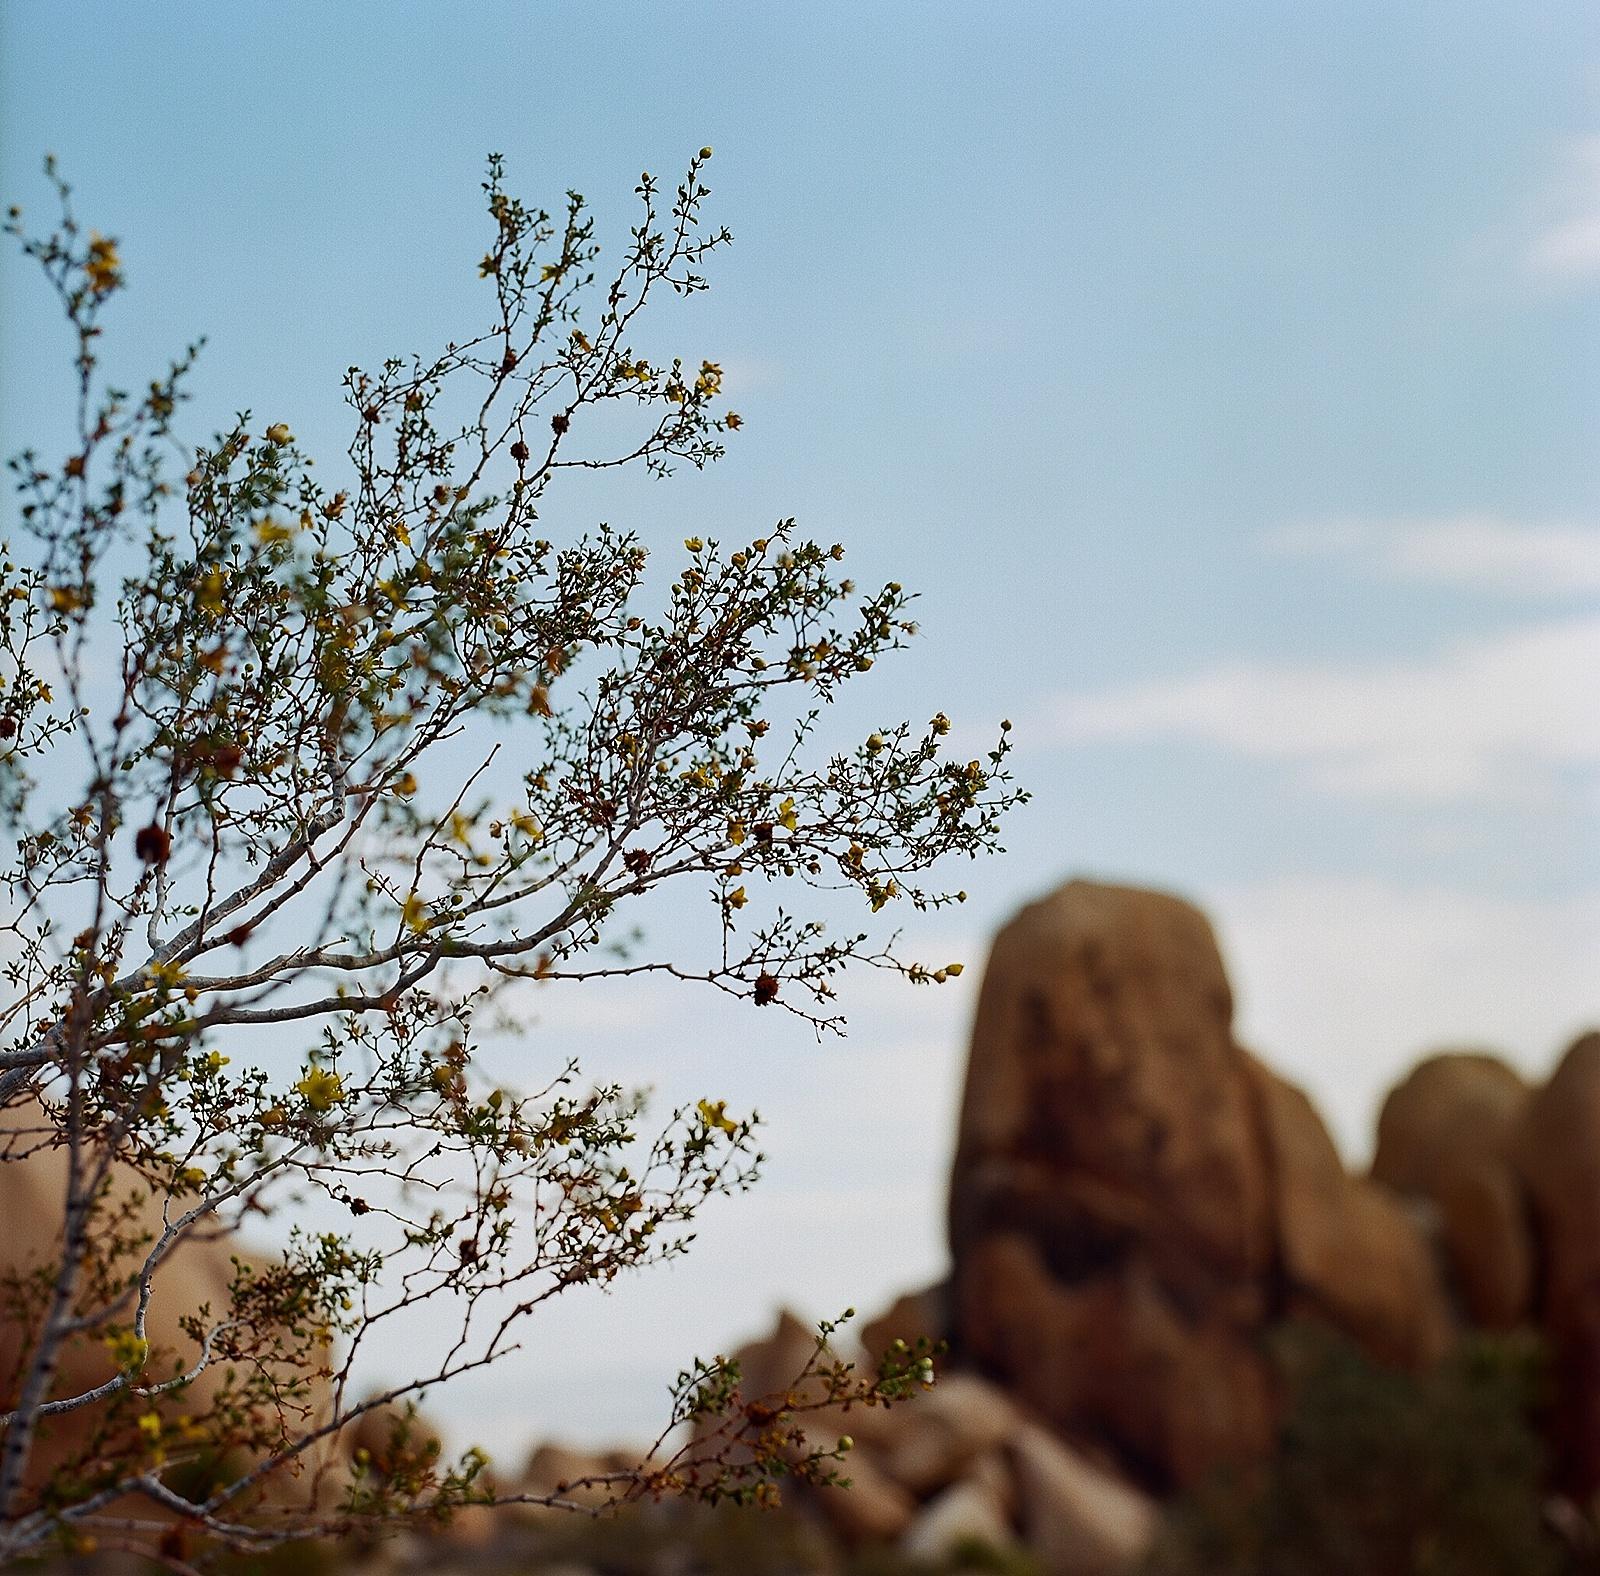 Joshua Tree landscape photography on Ektar film by San Diego portrait photographer Lauren Nygard